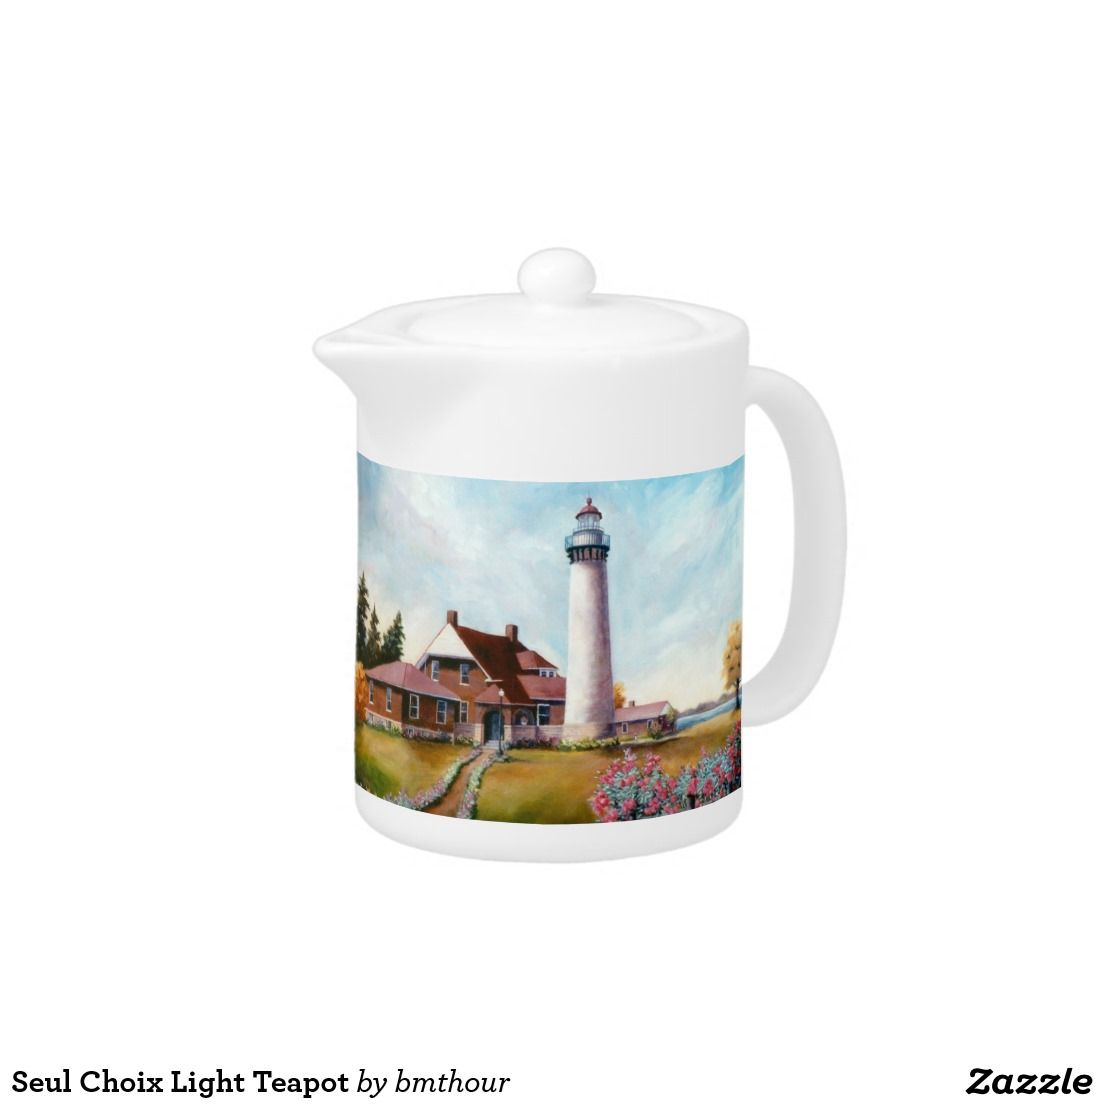 Seul Choix Light Teapot